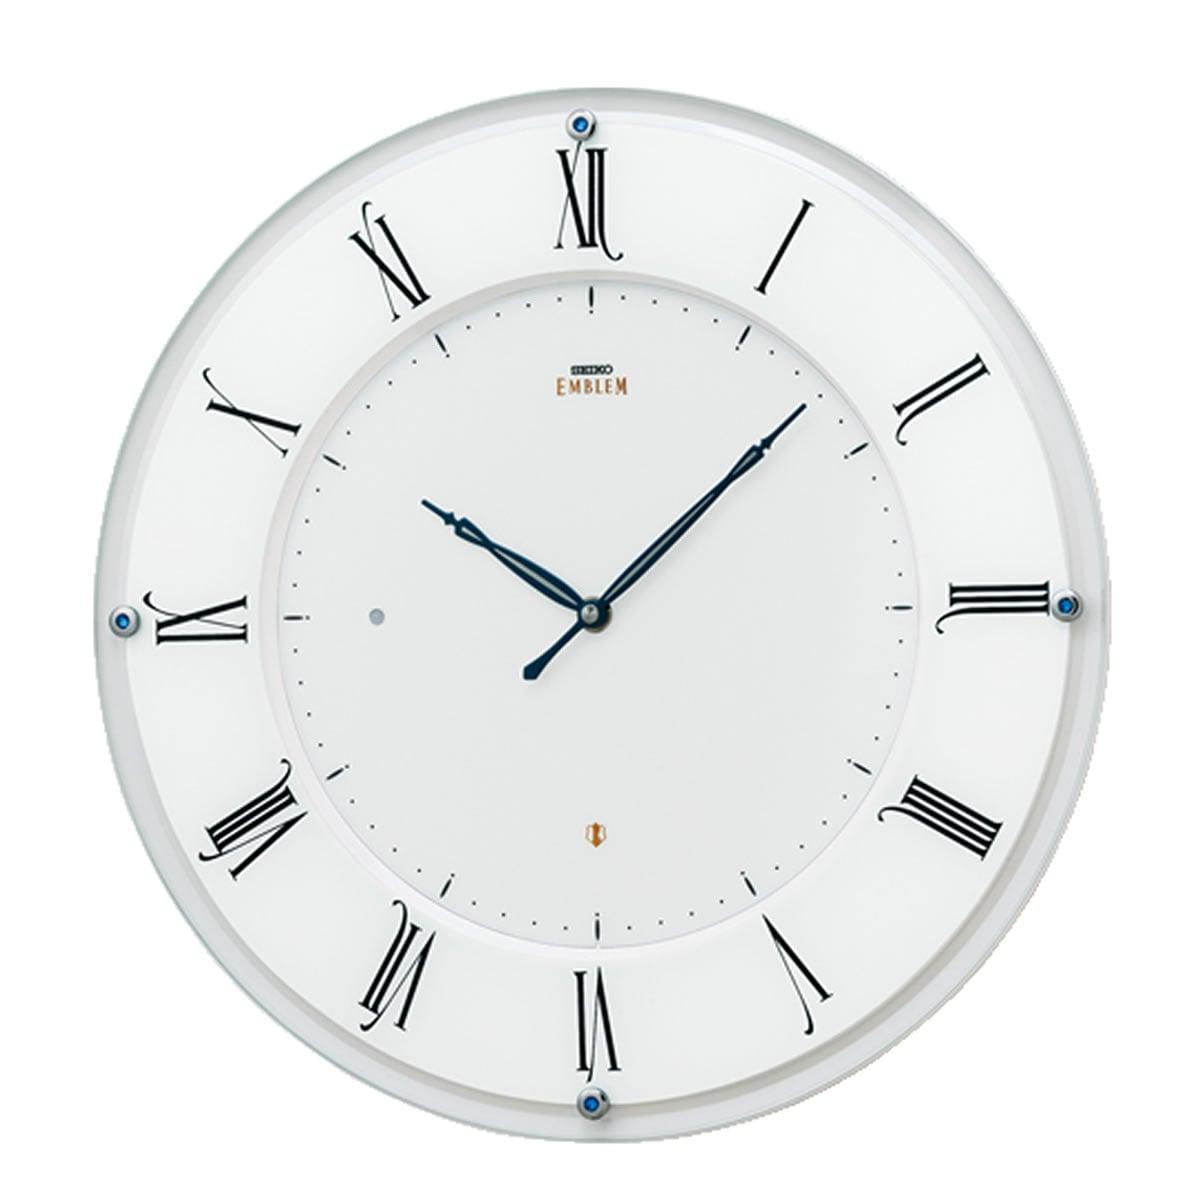 SEIKO EMBLEM(セイコー エムブレム)薄型電波掛け時計 HS548W 白【グリーン購入法適応商品】